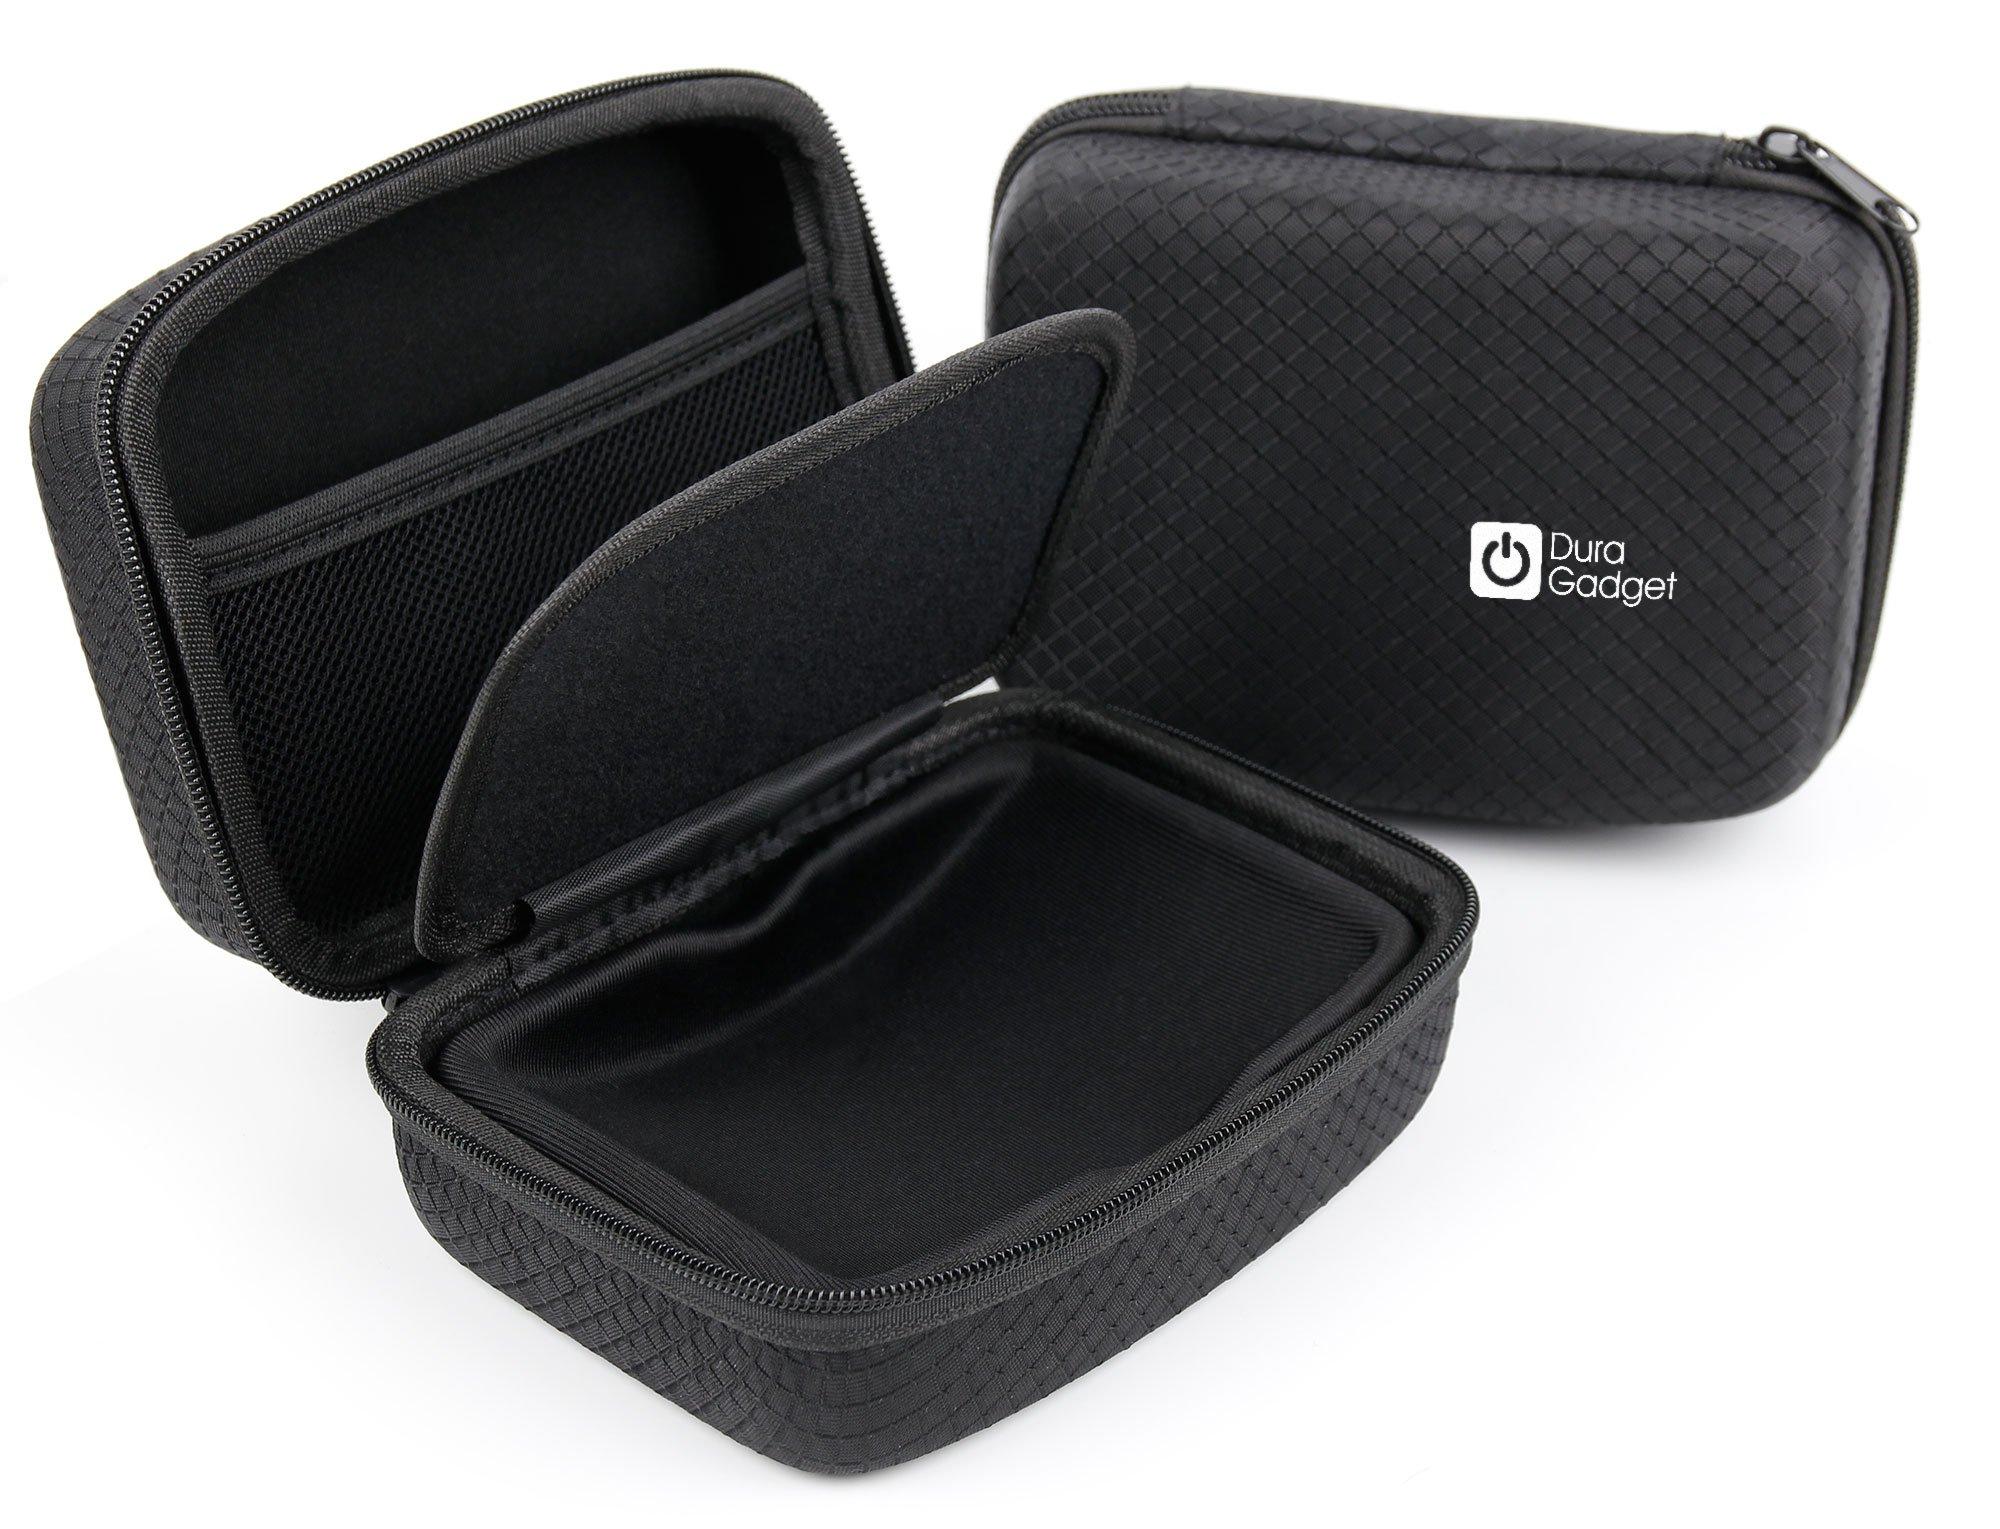 DURAGADGET Jet Black Hard EVA Carry Case for the Snapchat Snapshot Donut-Shaped Dual-Lens Mini Camera by DURAGADGET